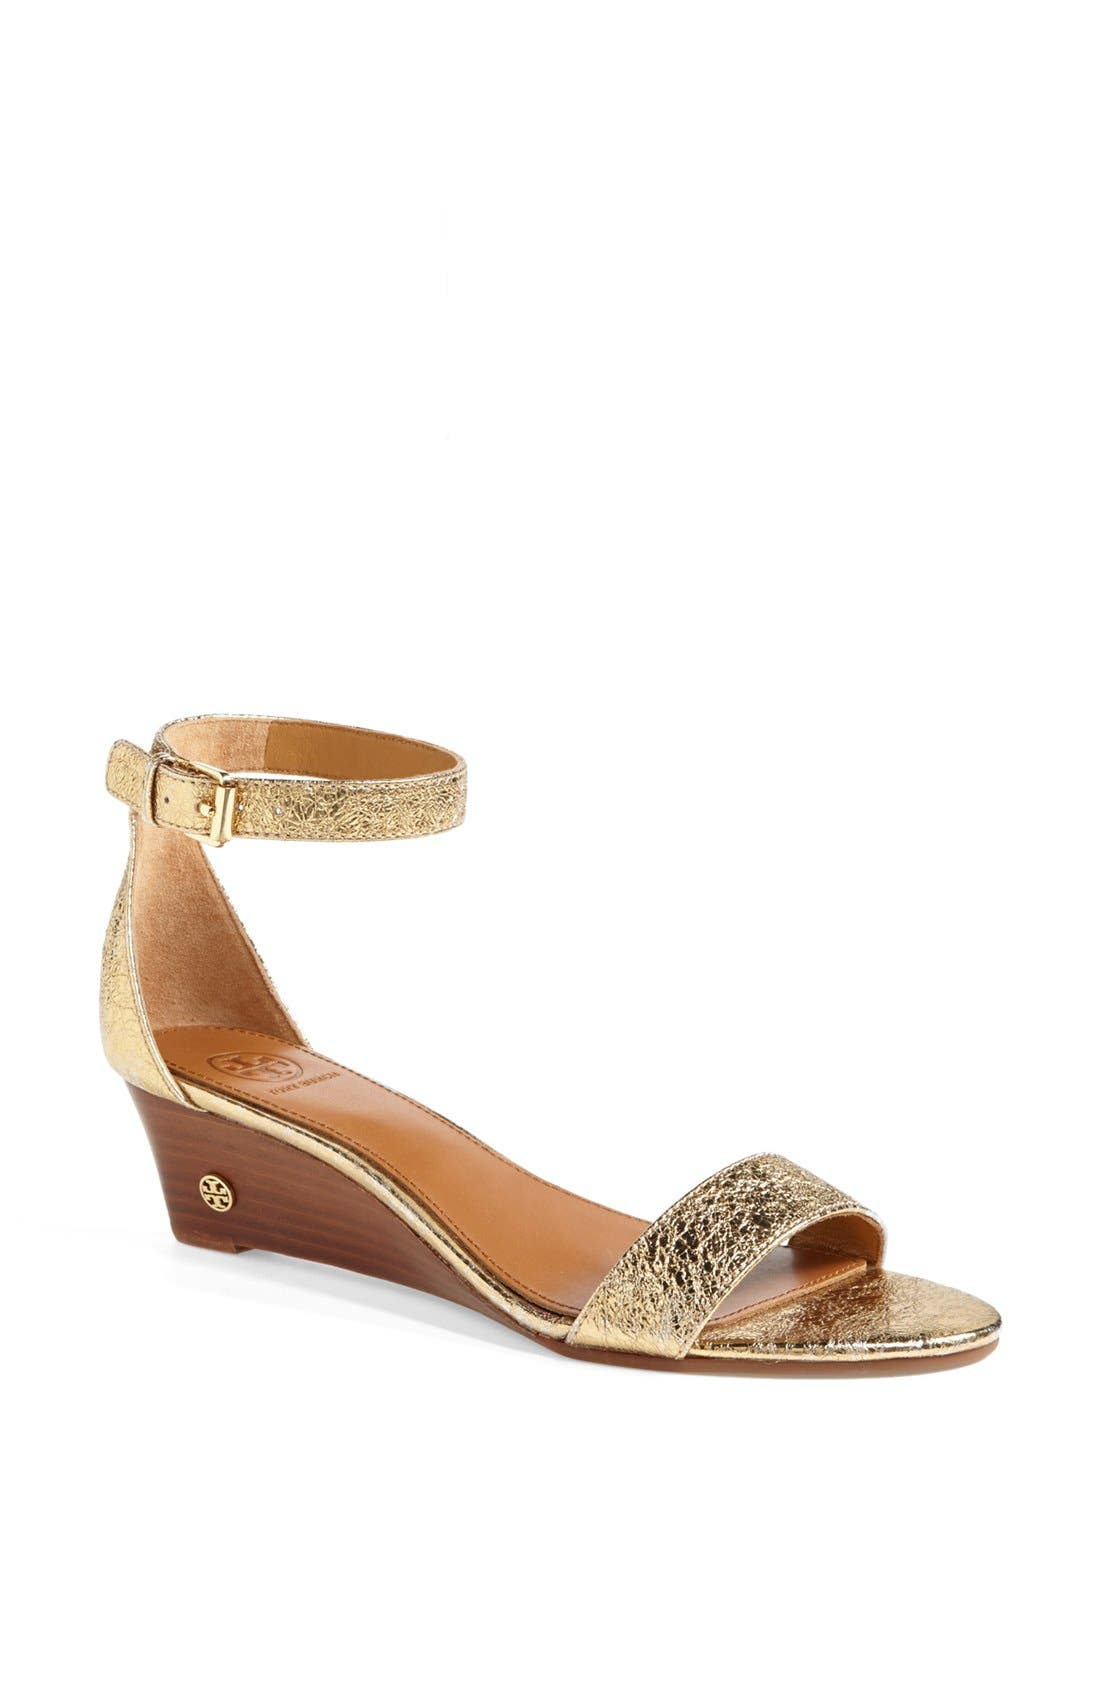 'Savannah' Wedge Sandal,                         Main,                         color, Gold